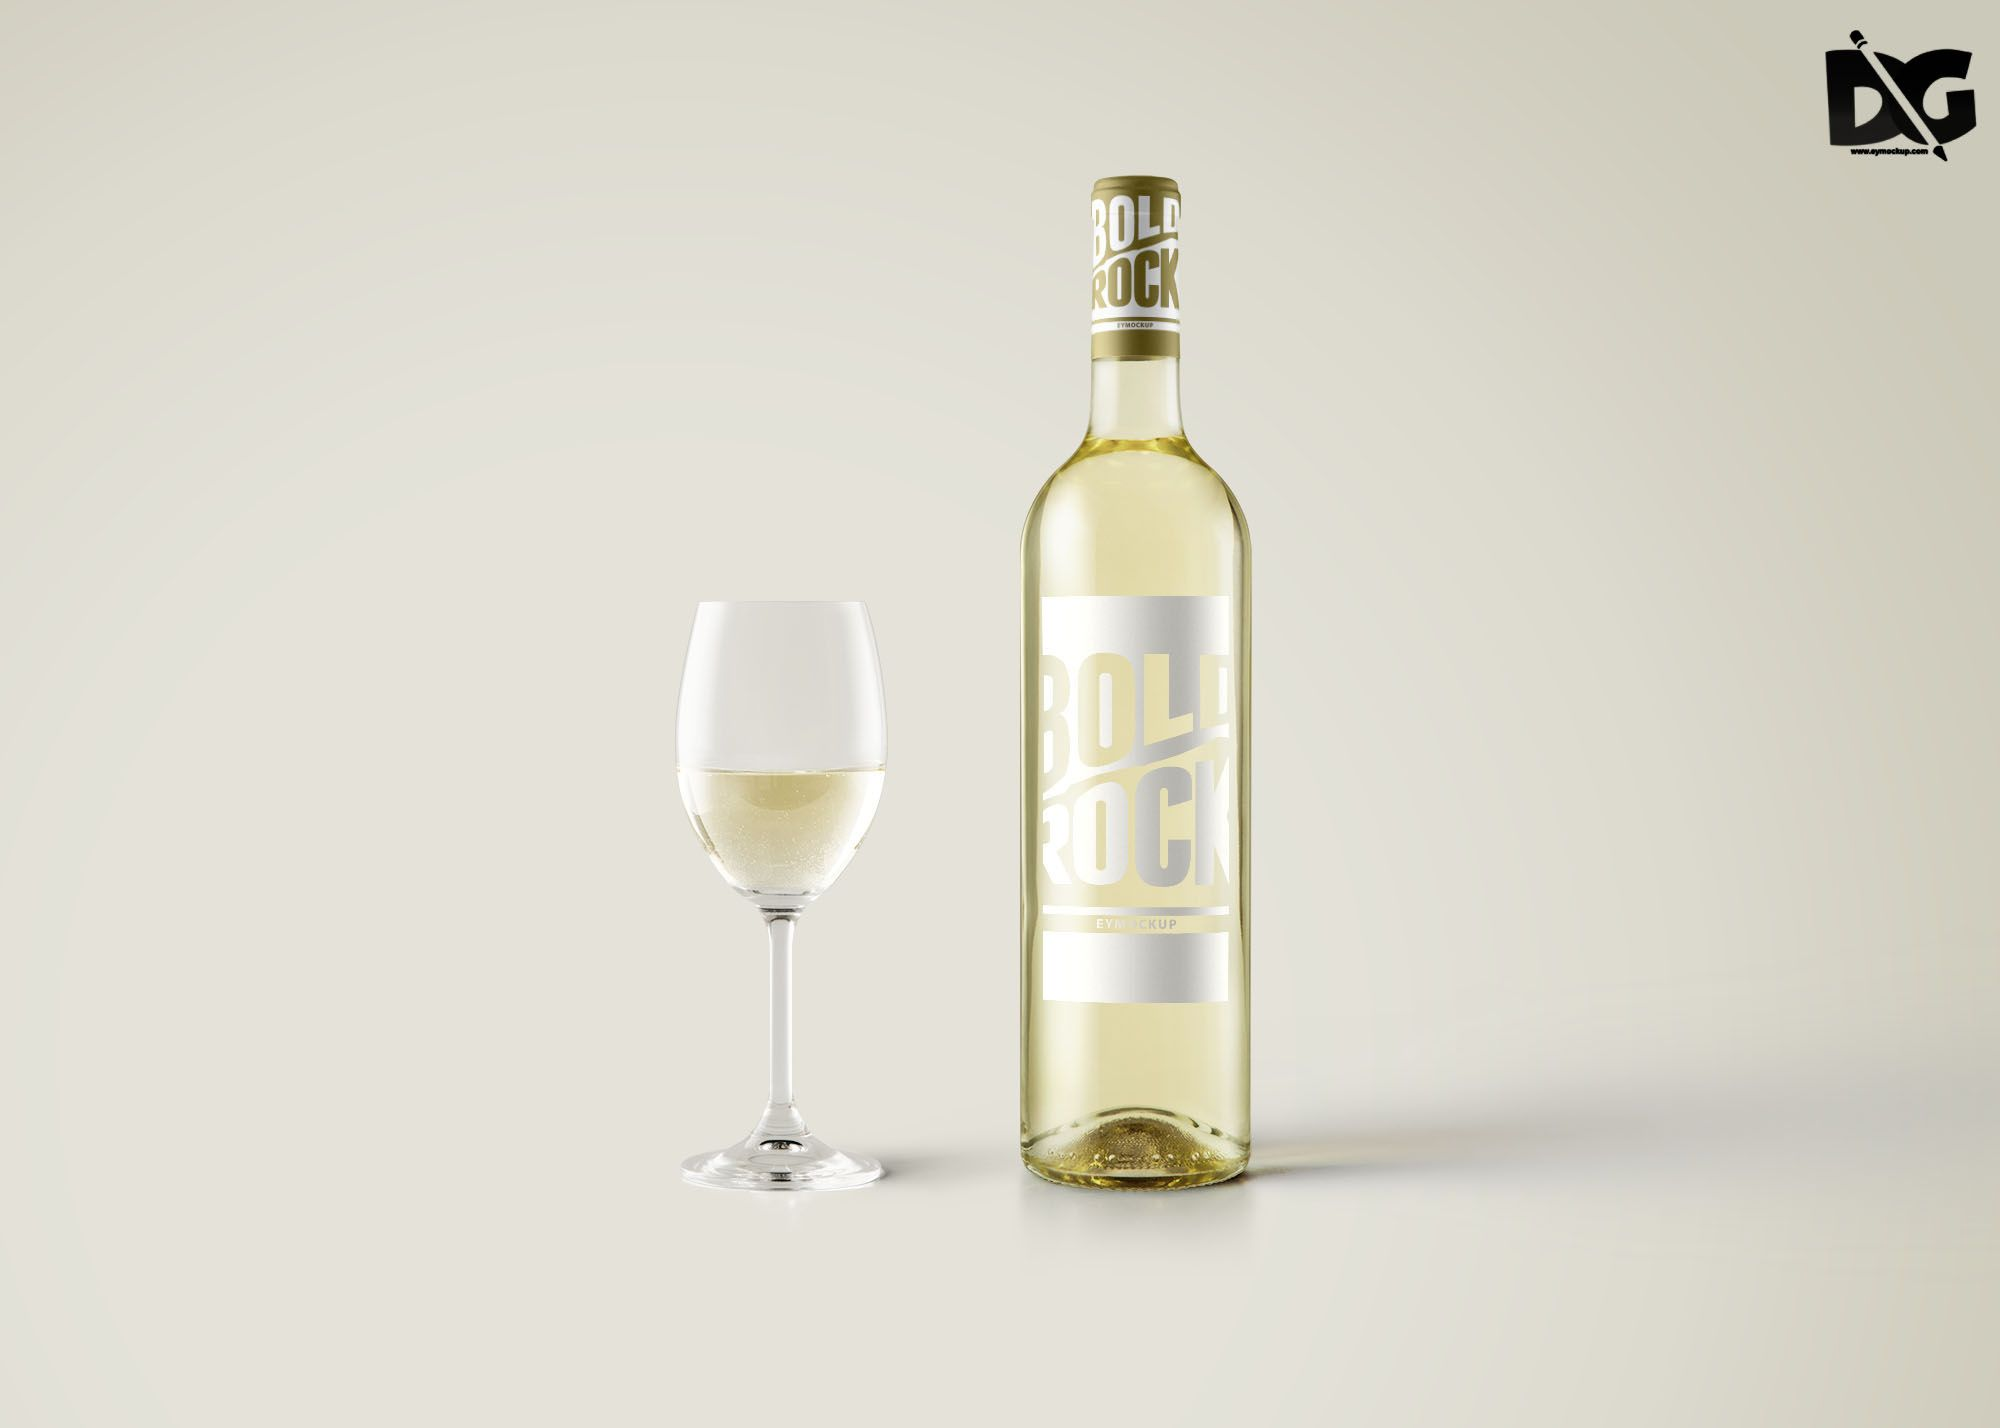 Transparent Wine Mockup Branding Download Downloadpsd Free Freemockup Freepsd Freebie Mock Up Mockup Mockup Free Psd Logo Design Mockup Bottle Mockup